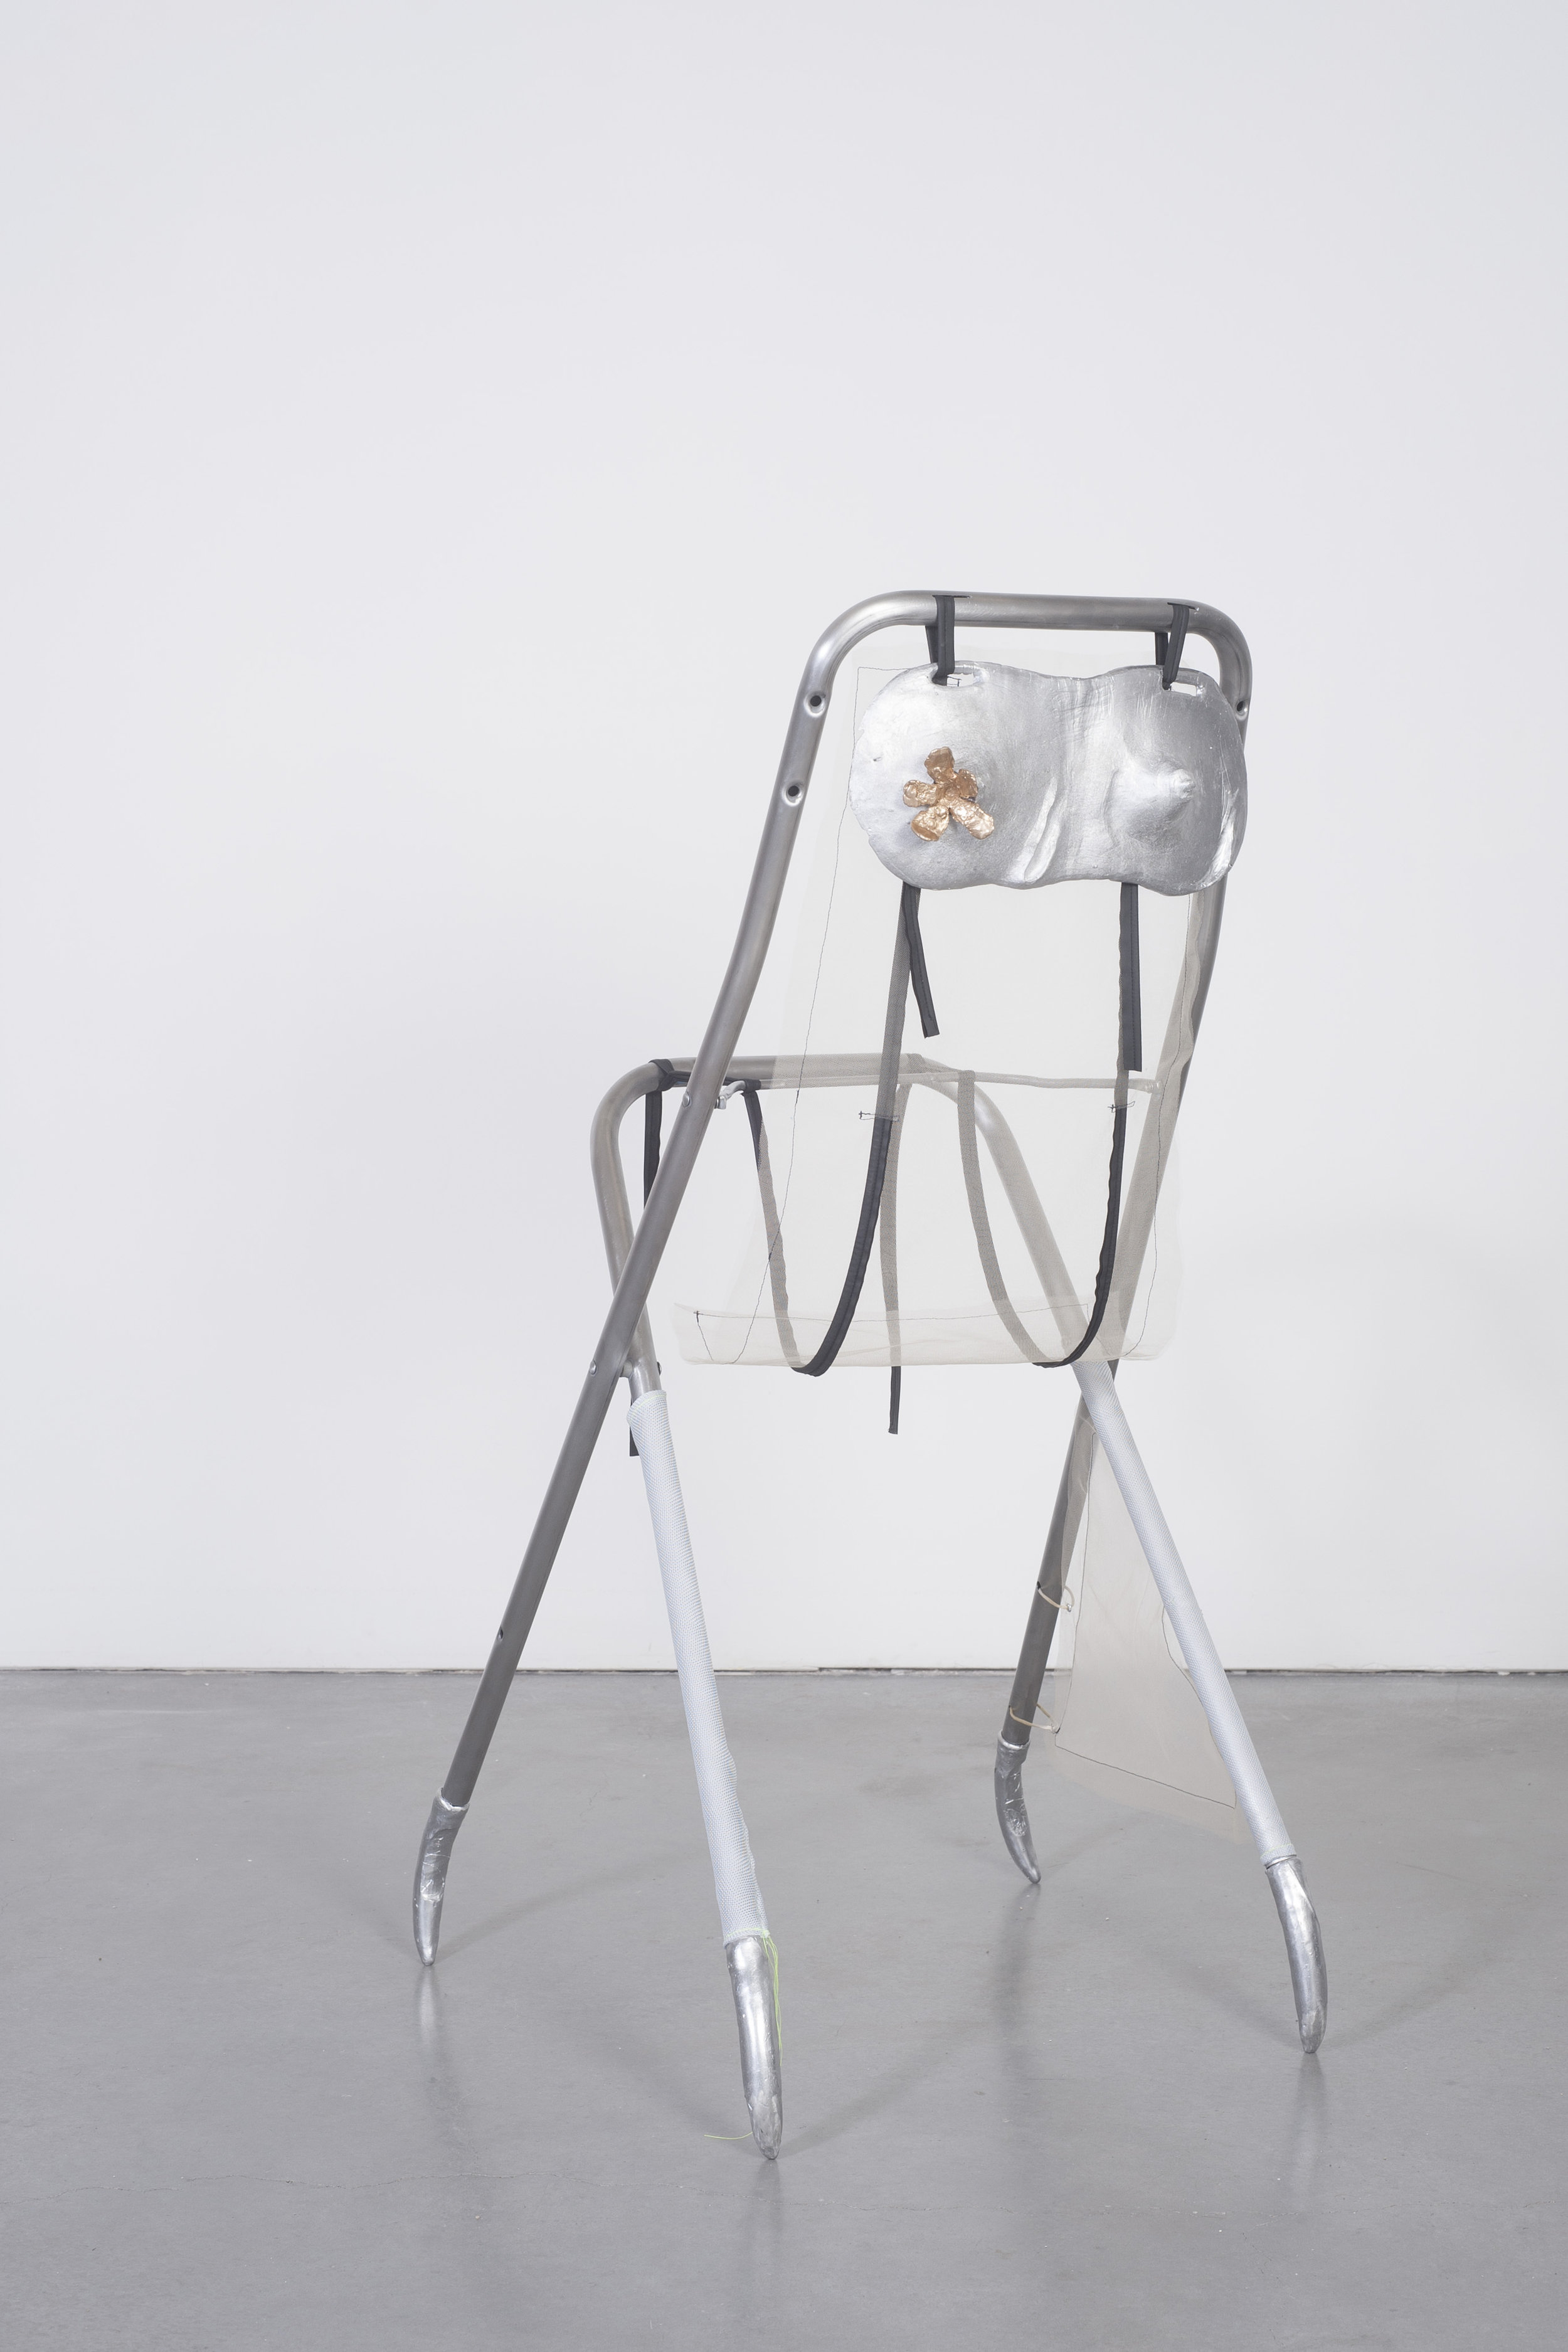 Ellie Hunter,  Trying it on , 2019, Cast aluminum, cast bronze, fabric, chair